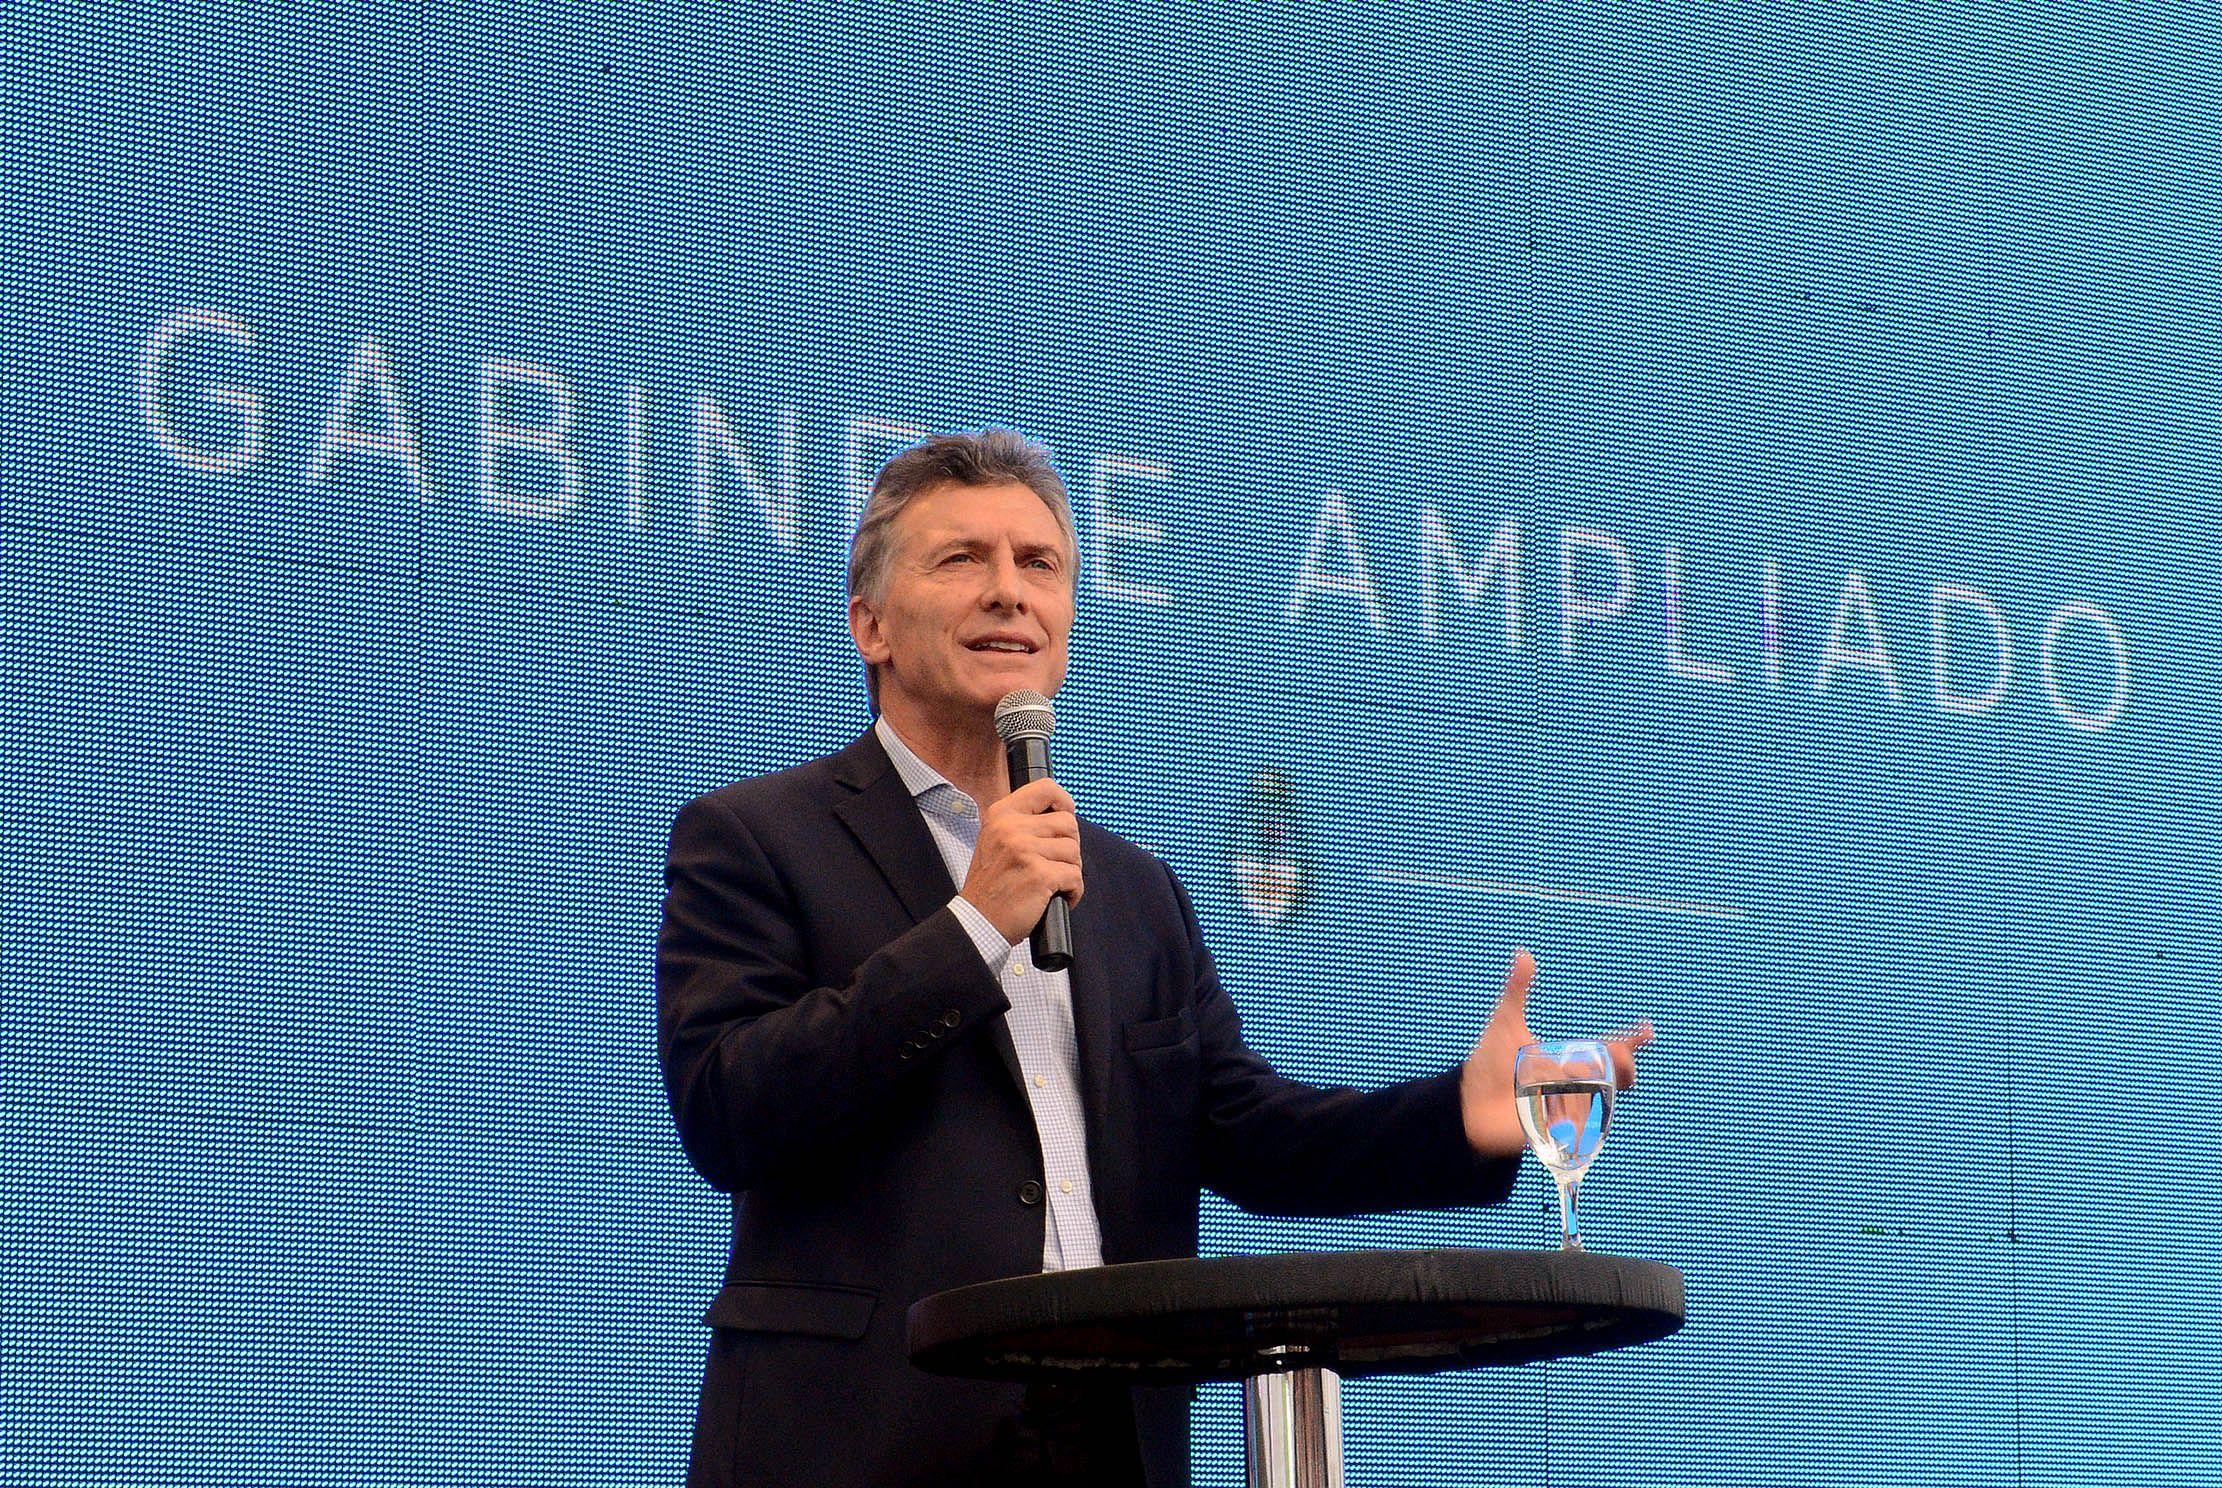 Macri recibe a representante de la Unión Europea